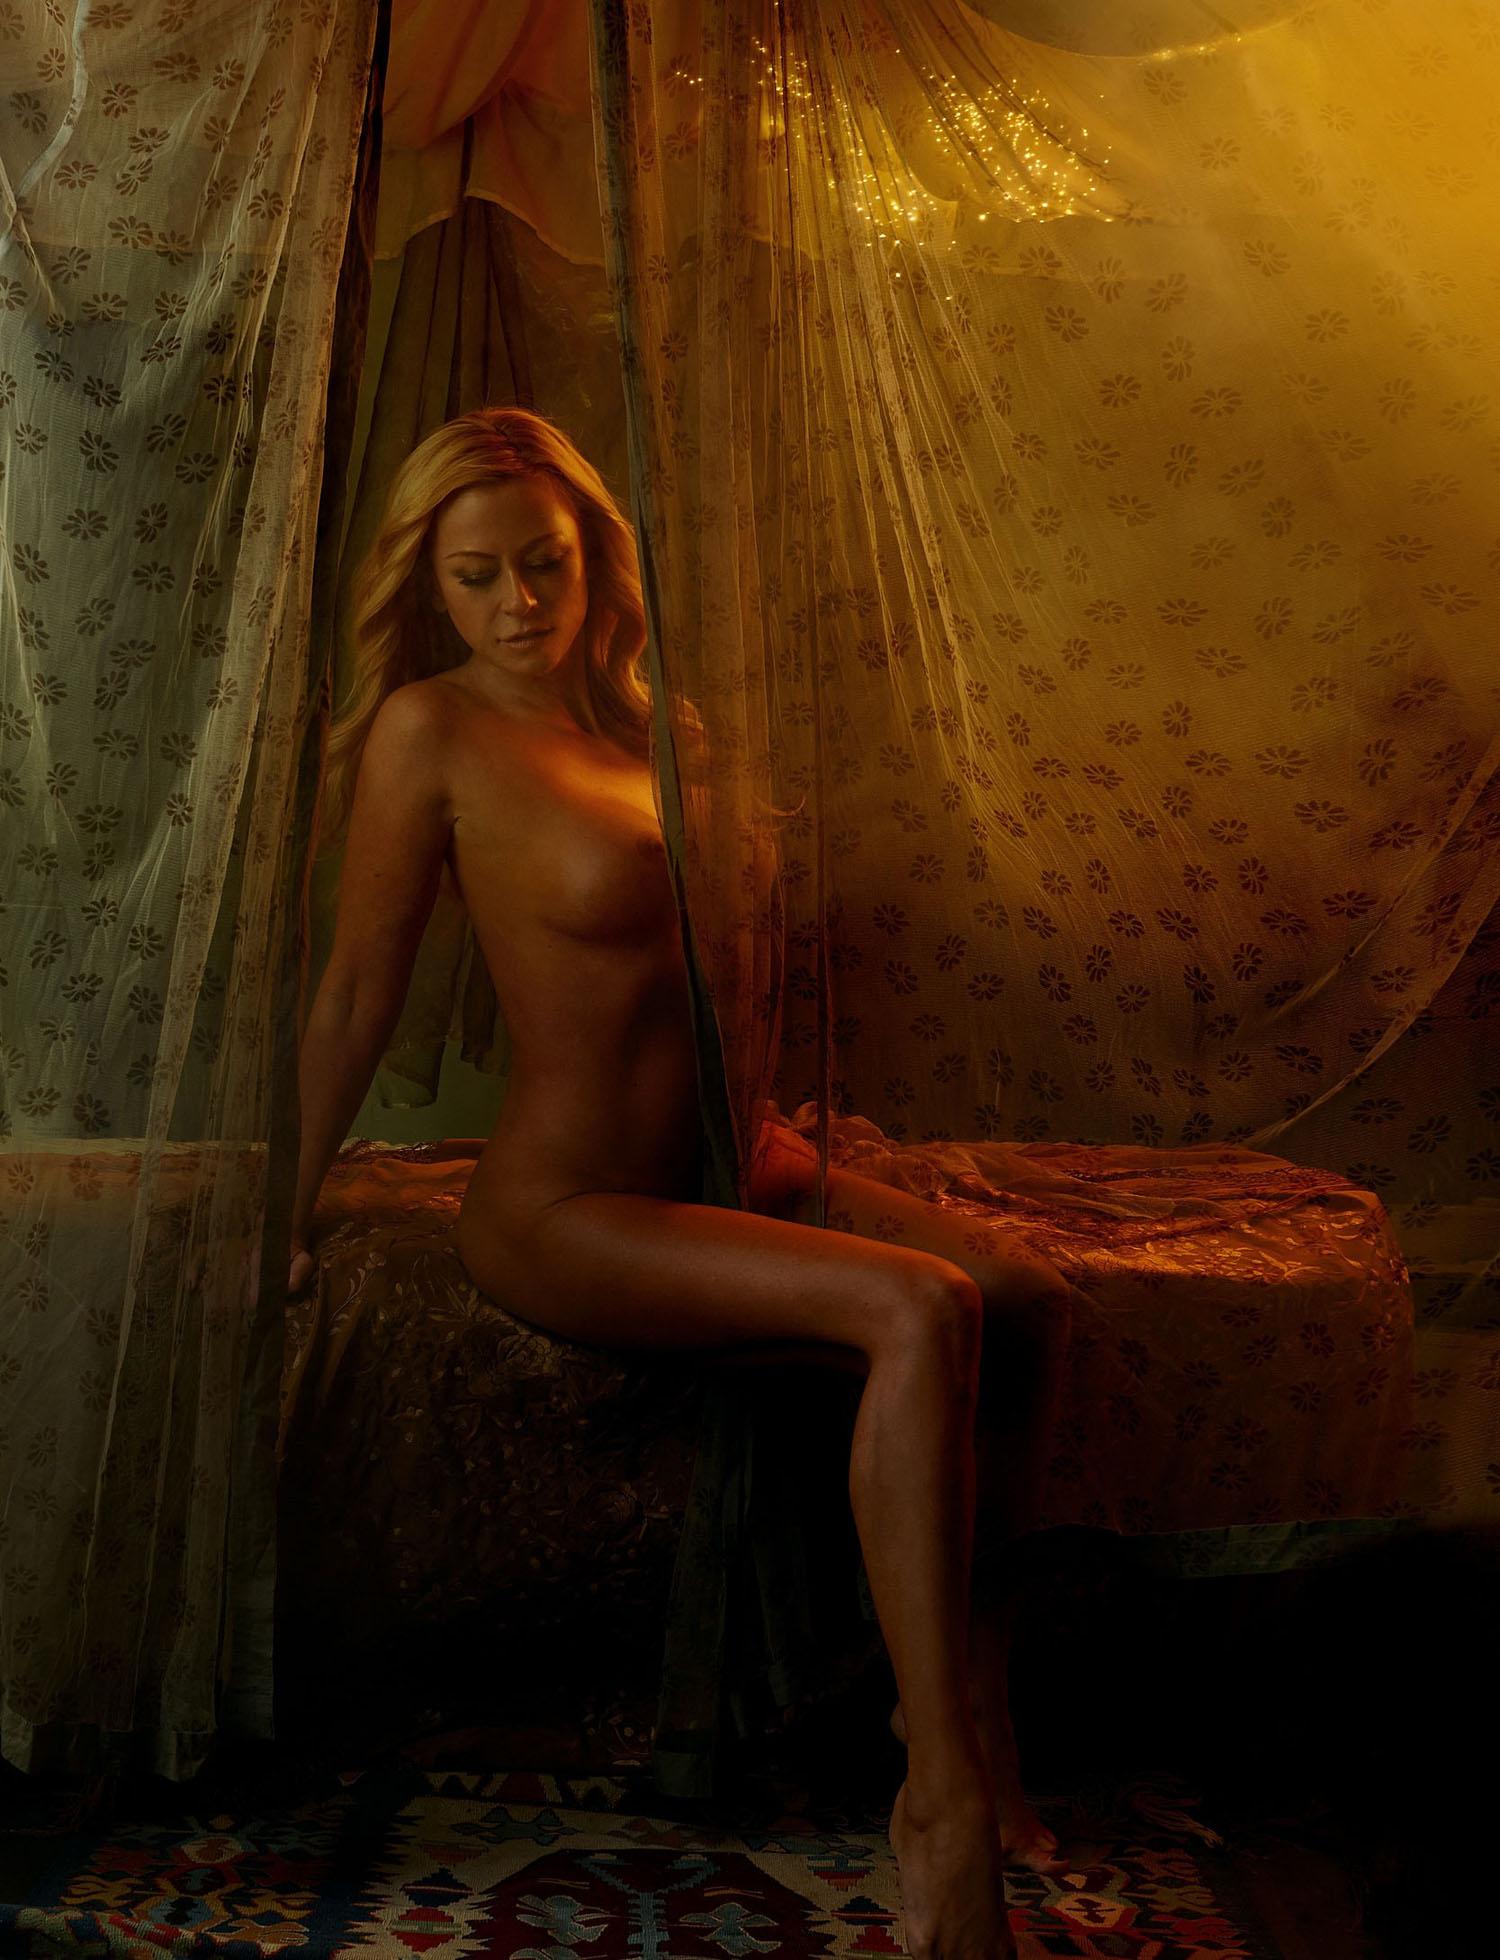 Дженни Элверс голая. Фото - 26